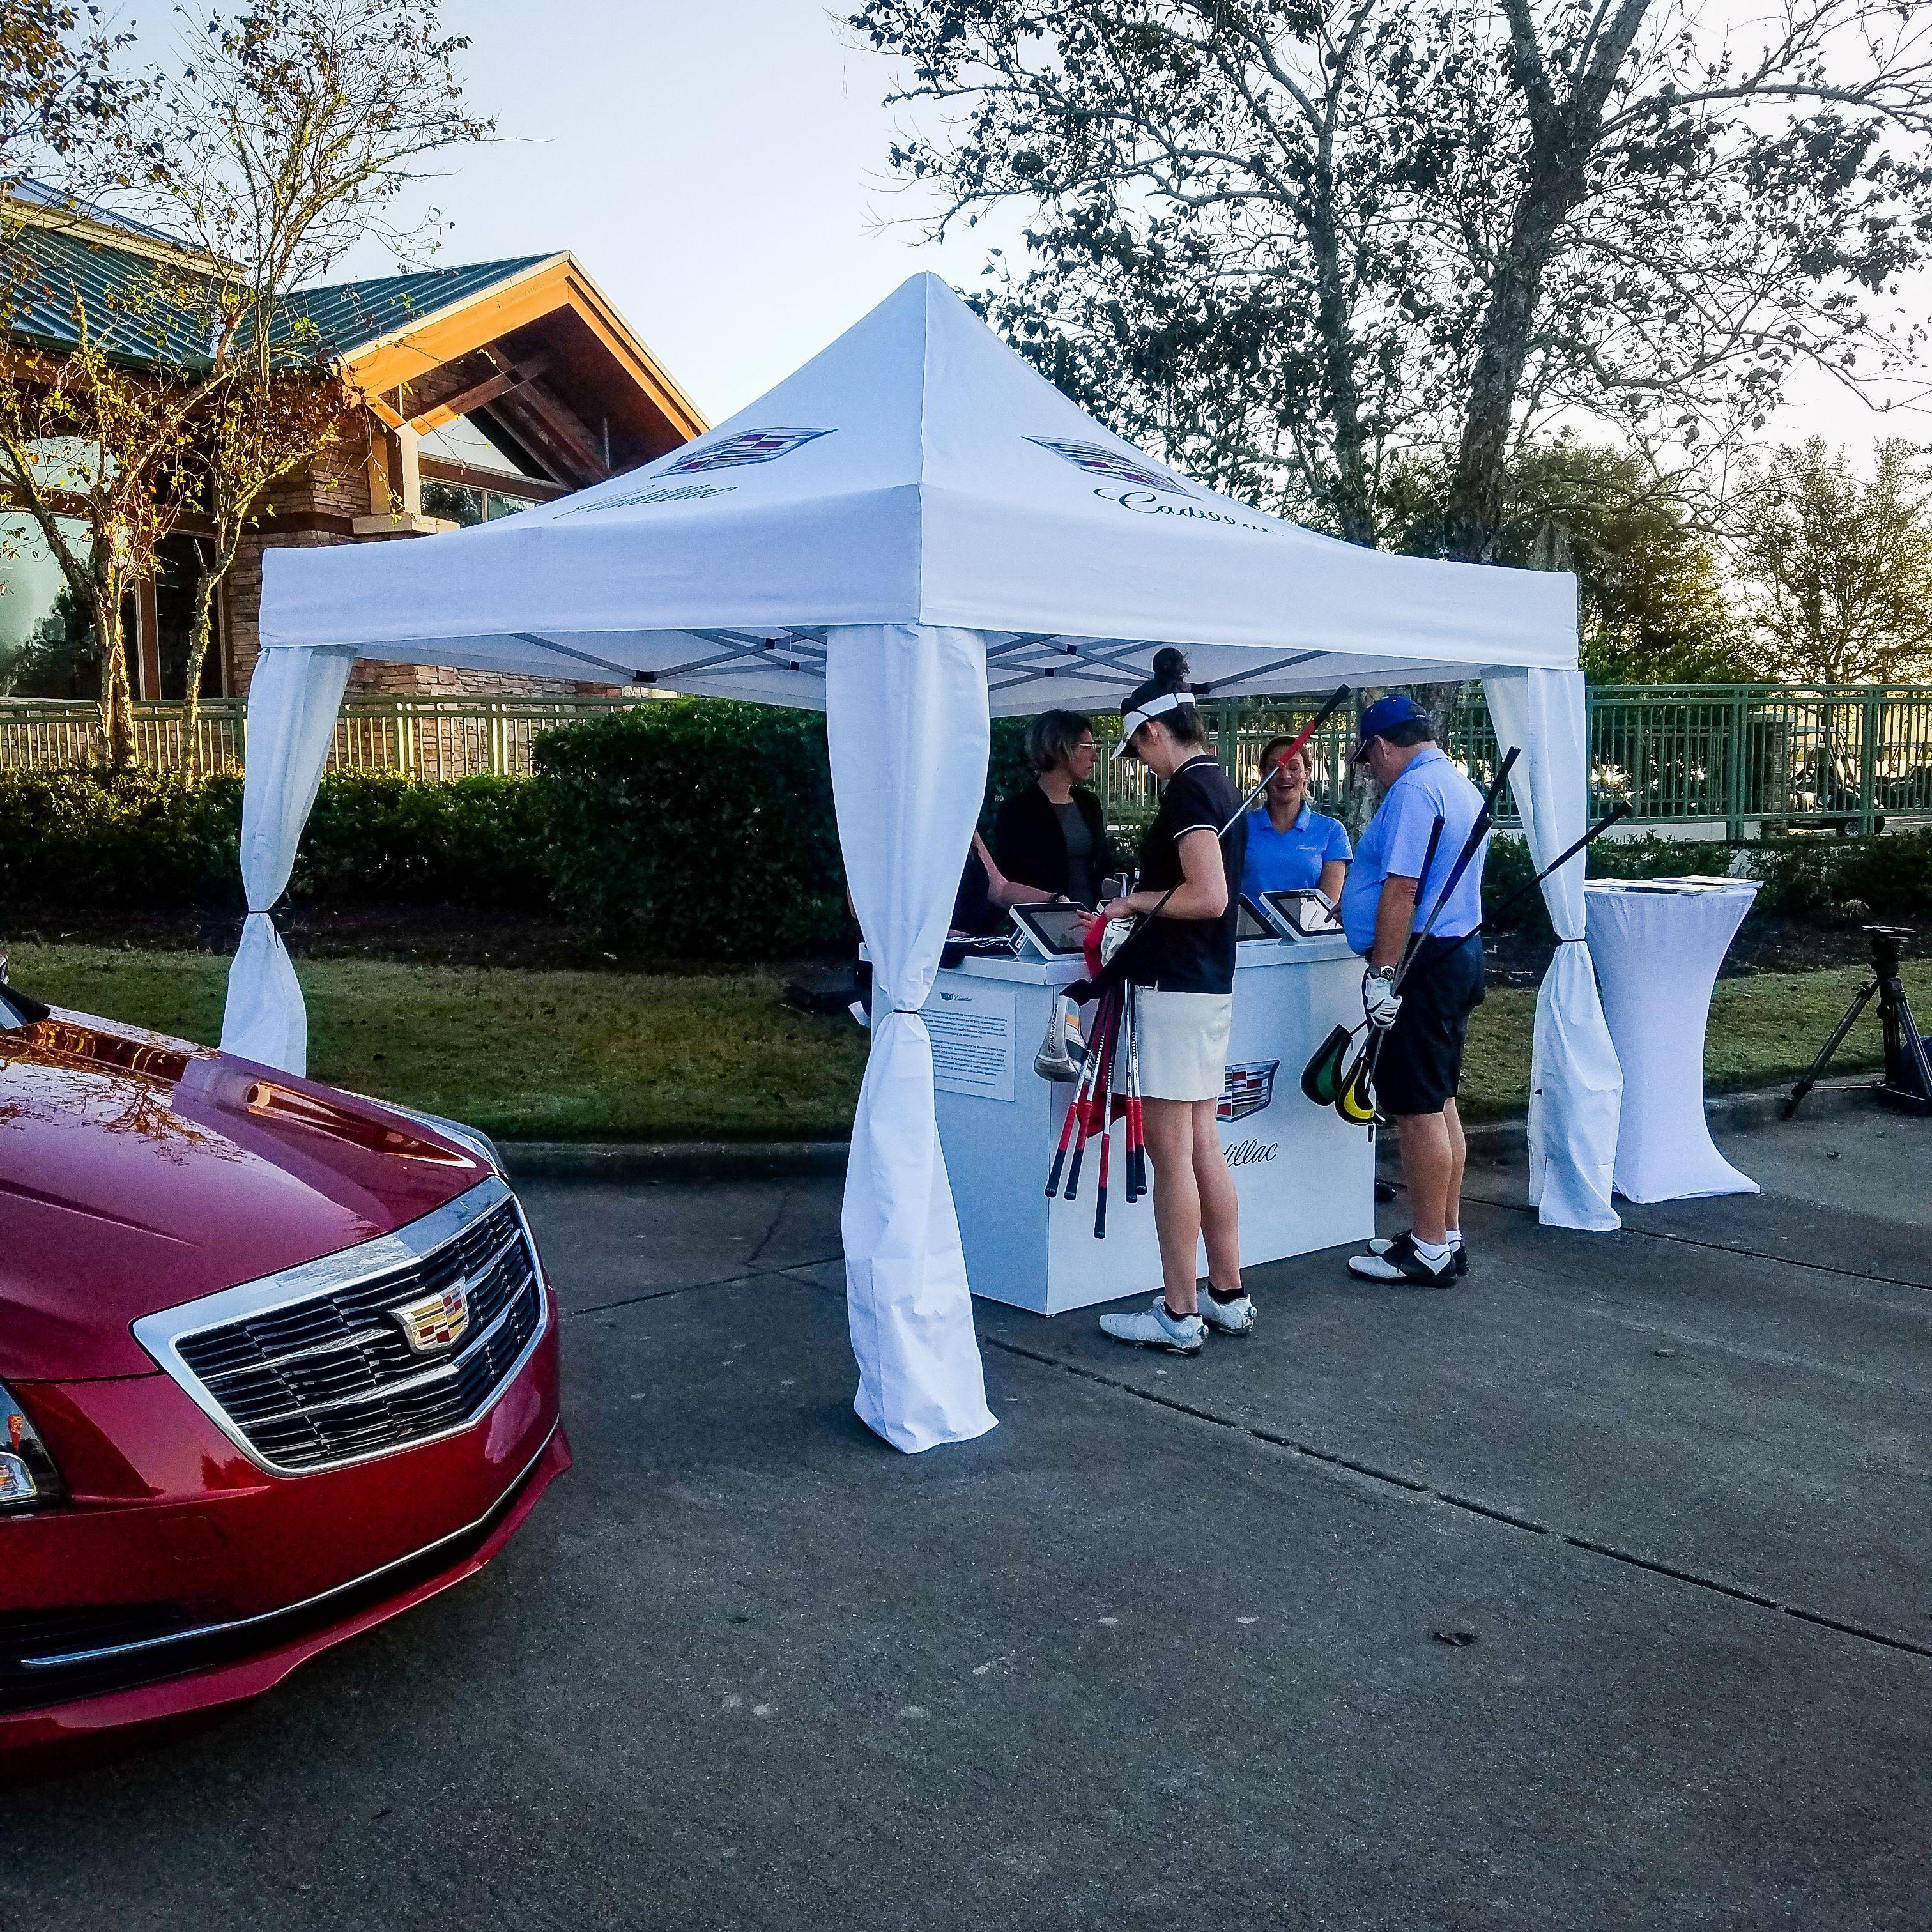 Fields Auto Group & Fields Cadillac Jacksonville were proud sponsors